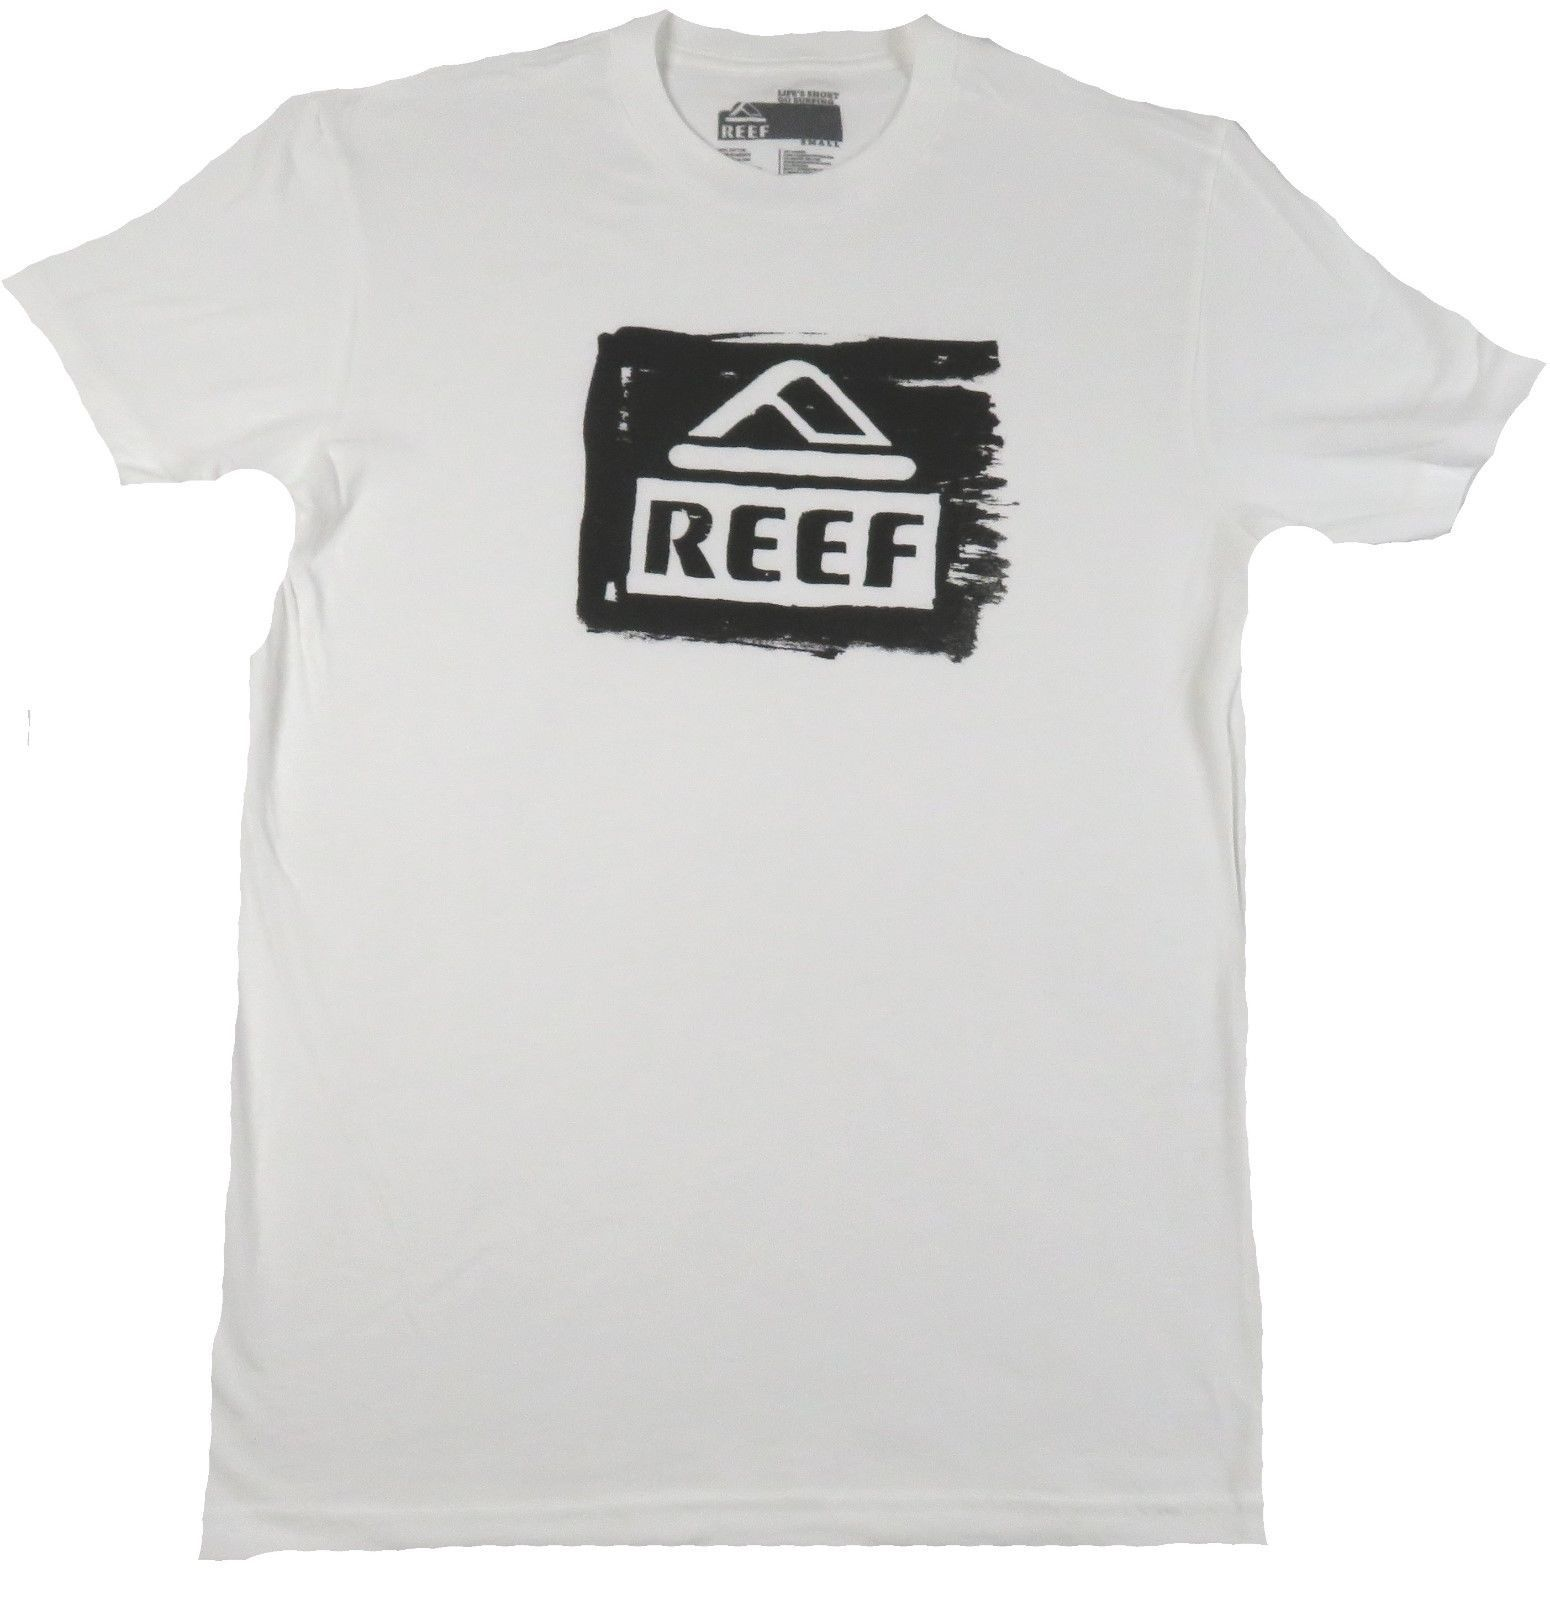 Men's REEF Tee Shirt Surfing Beach Casual Fish T-shirt White Vintage Logo